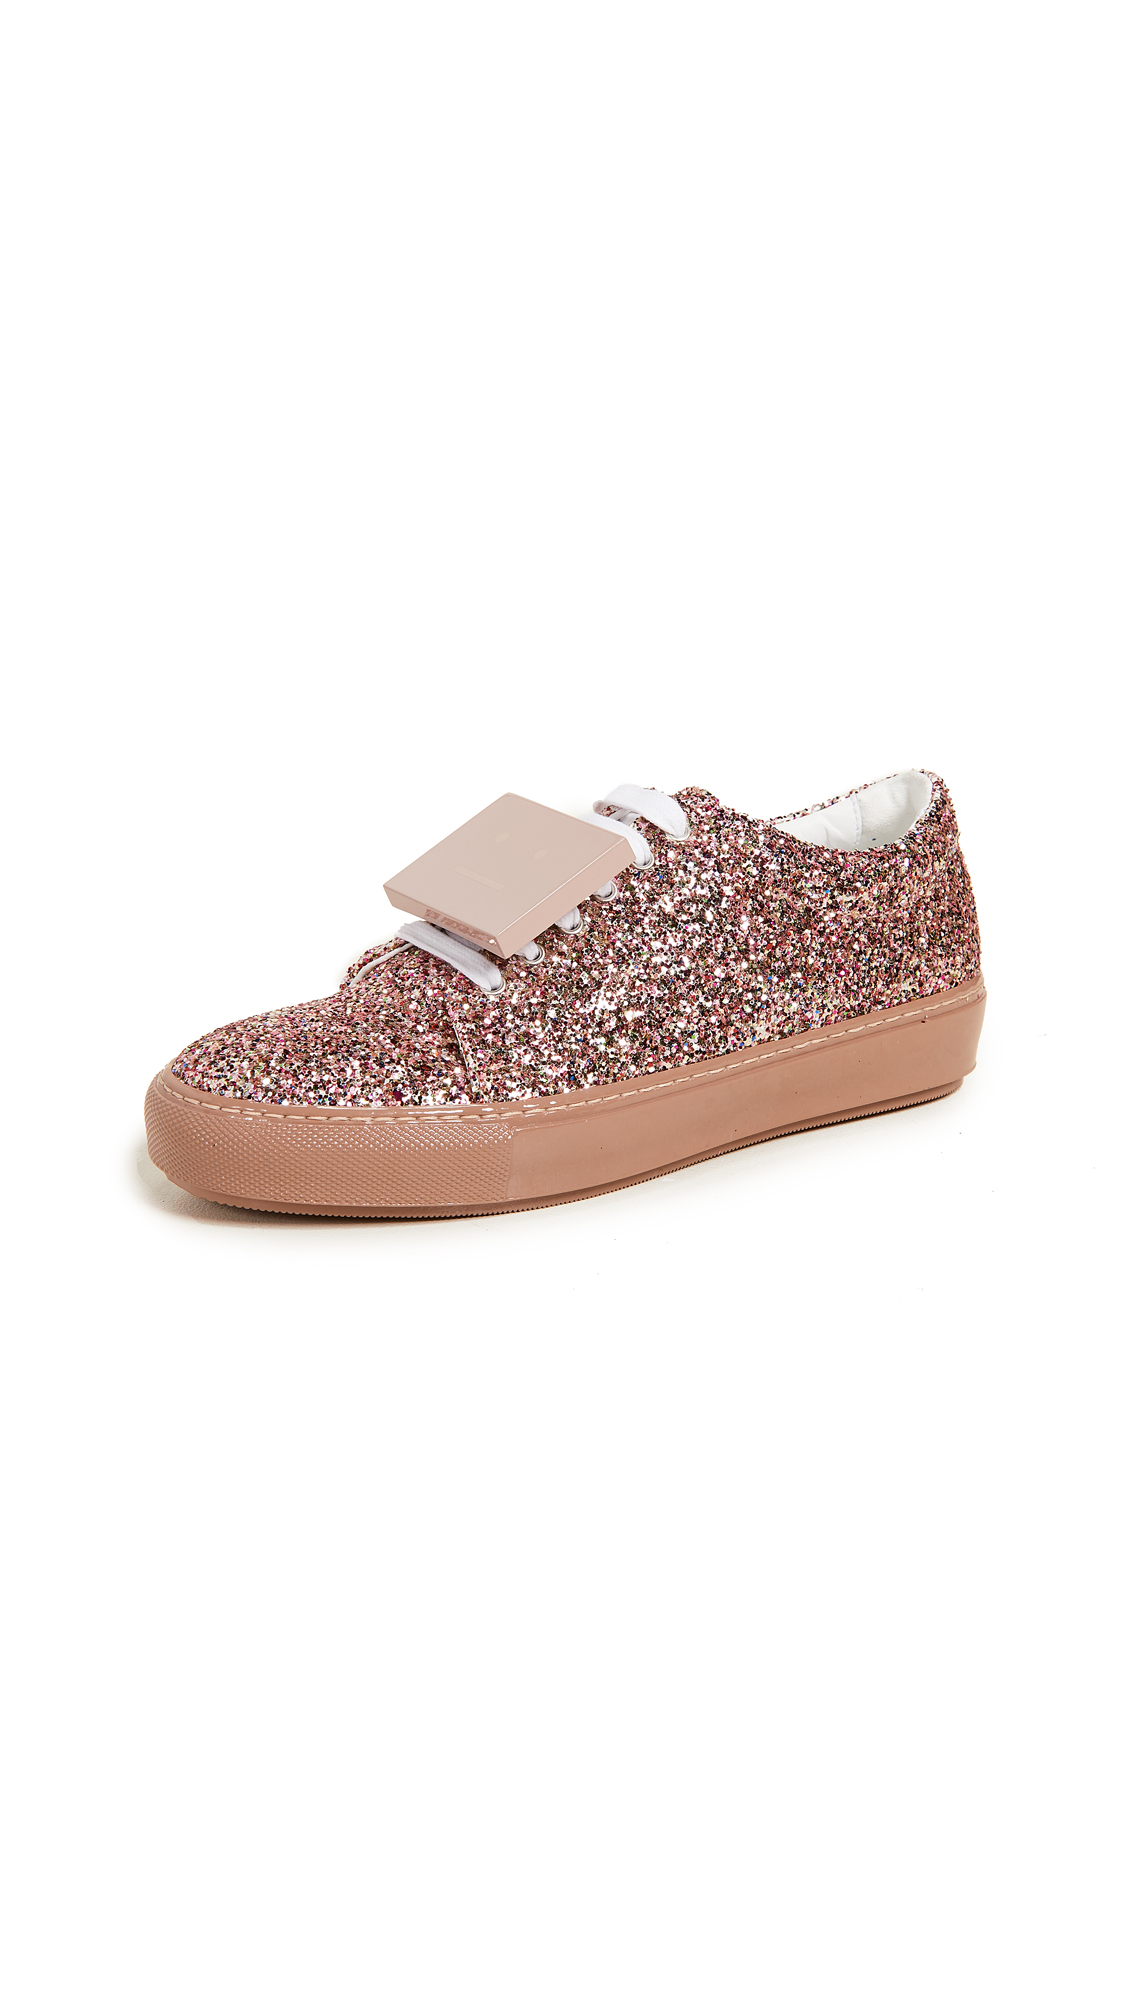 Acne Studios Adriana Spark Sneakers - Pink/Multi